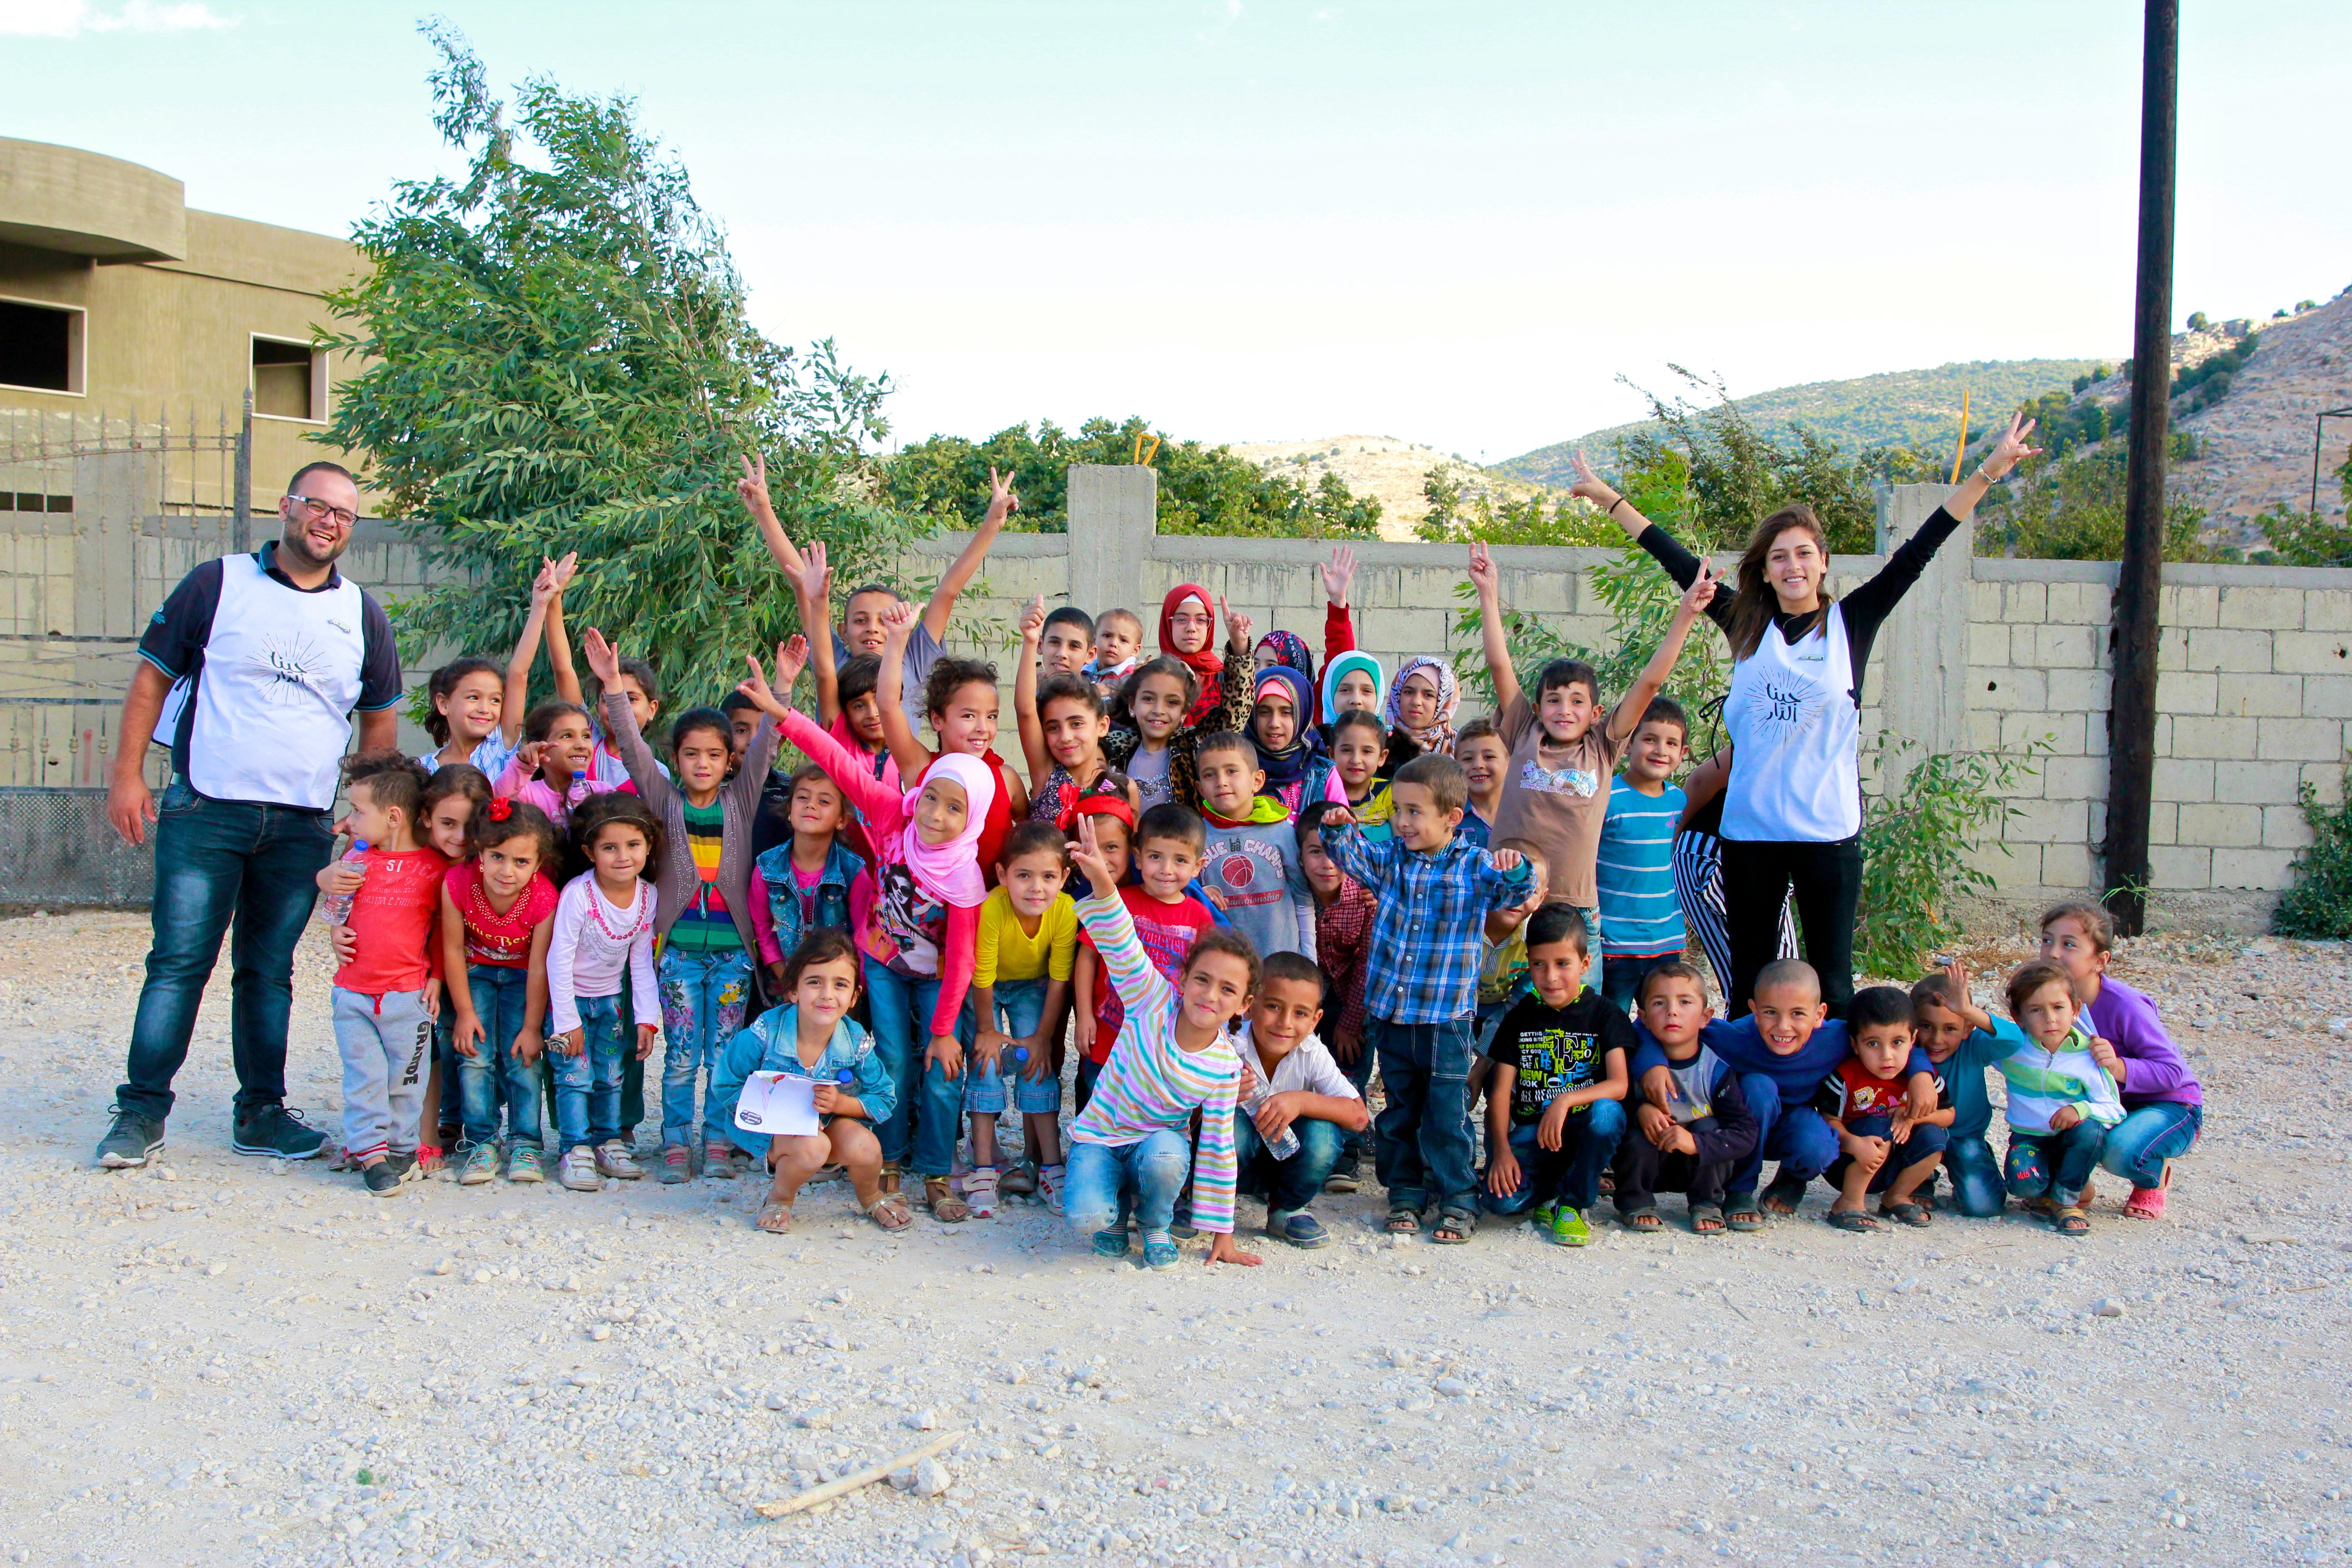 http://m-foundation.org/wp-content/uploads/2019/09/jina-el-dar-2-akroum-1.jpg